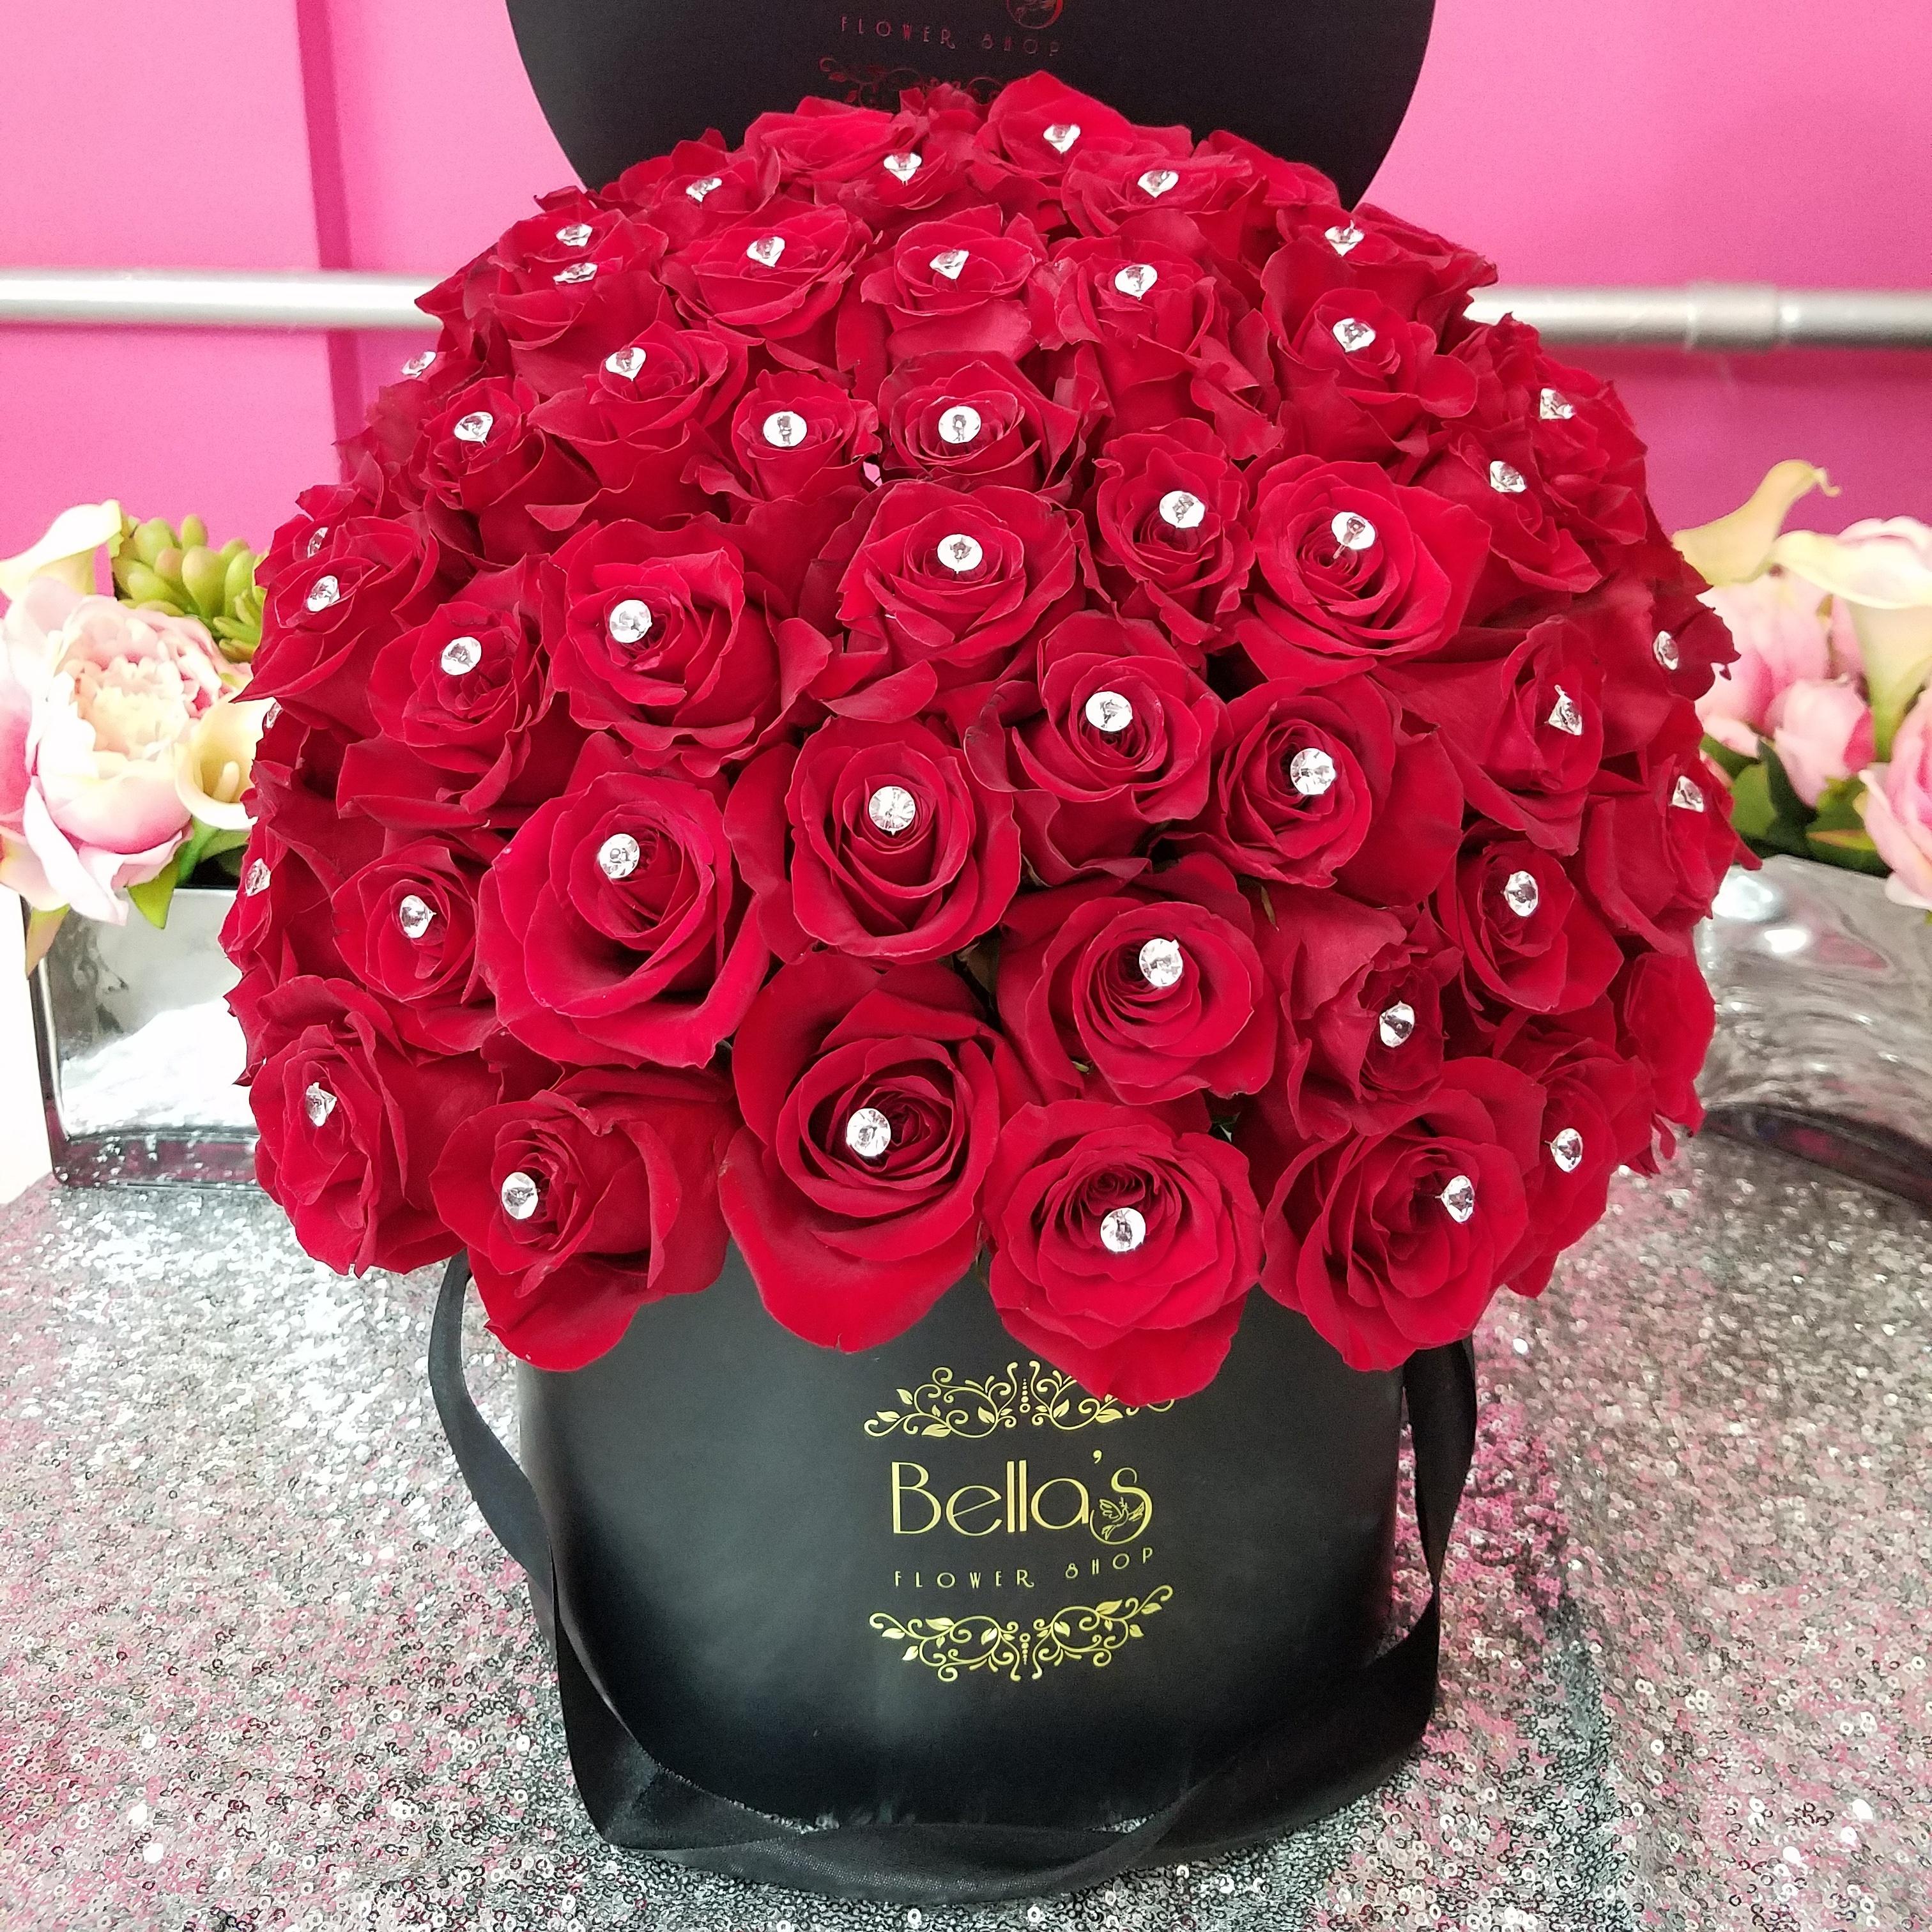 Bellas Flower Shop Google